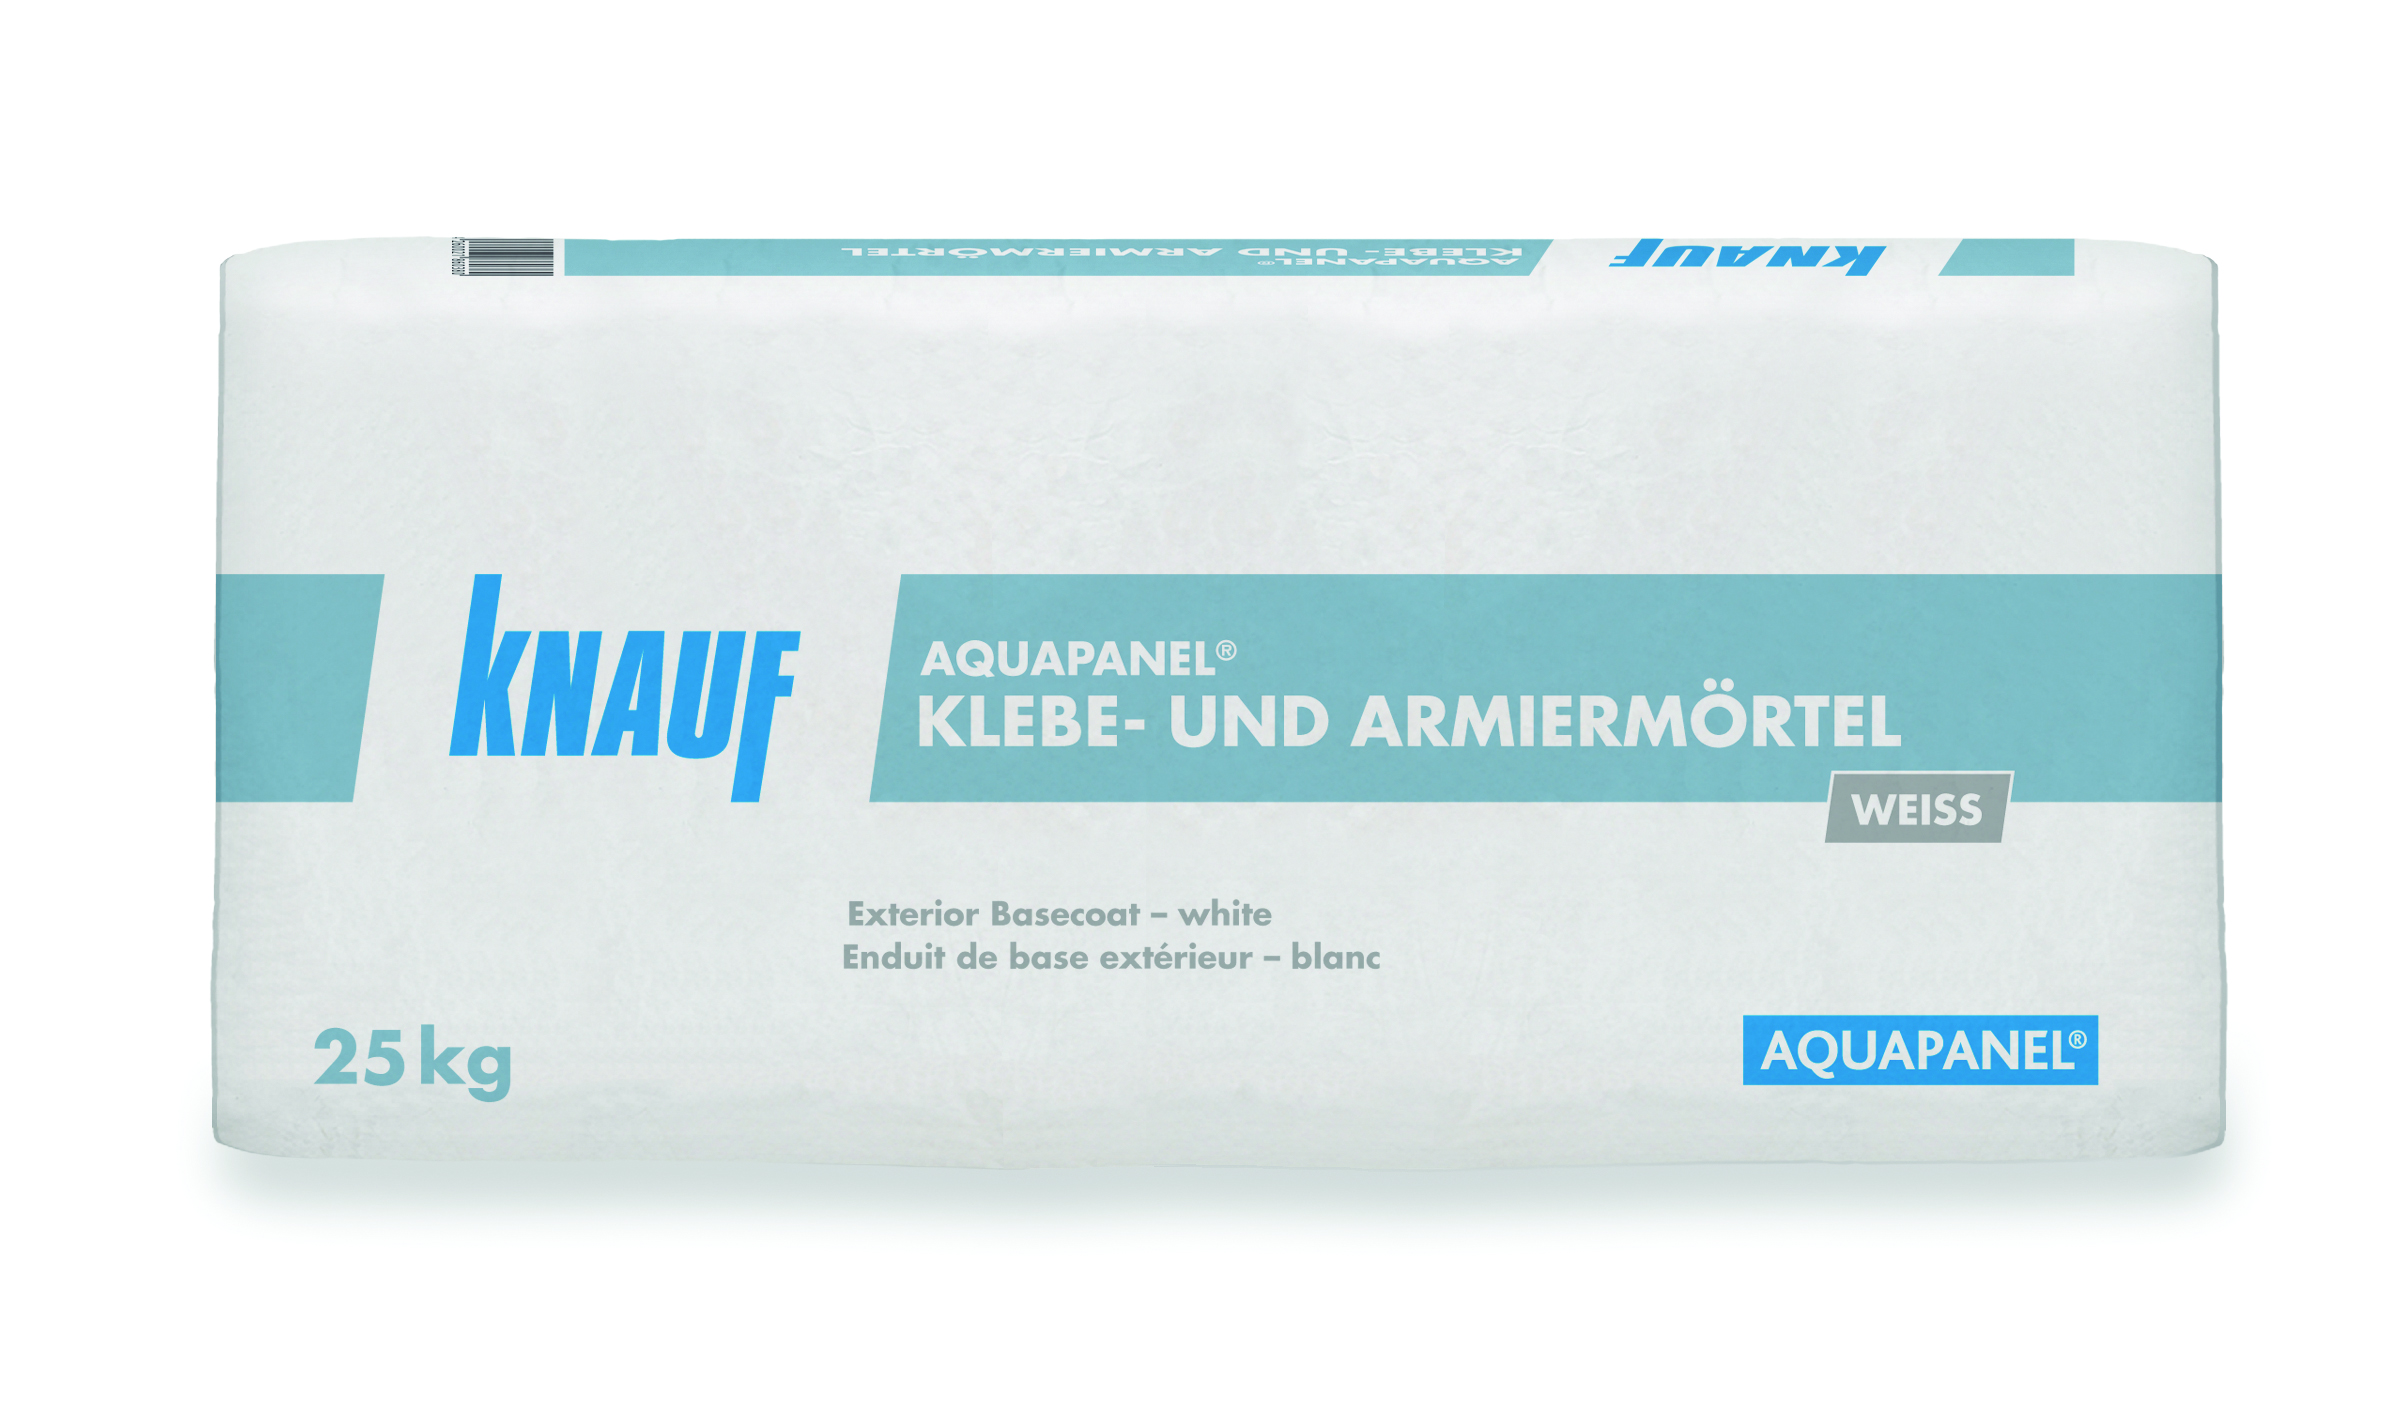 AQUAPANEL® Exterior Basecoat - White